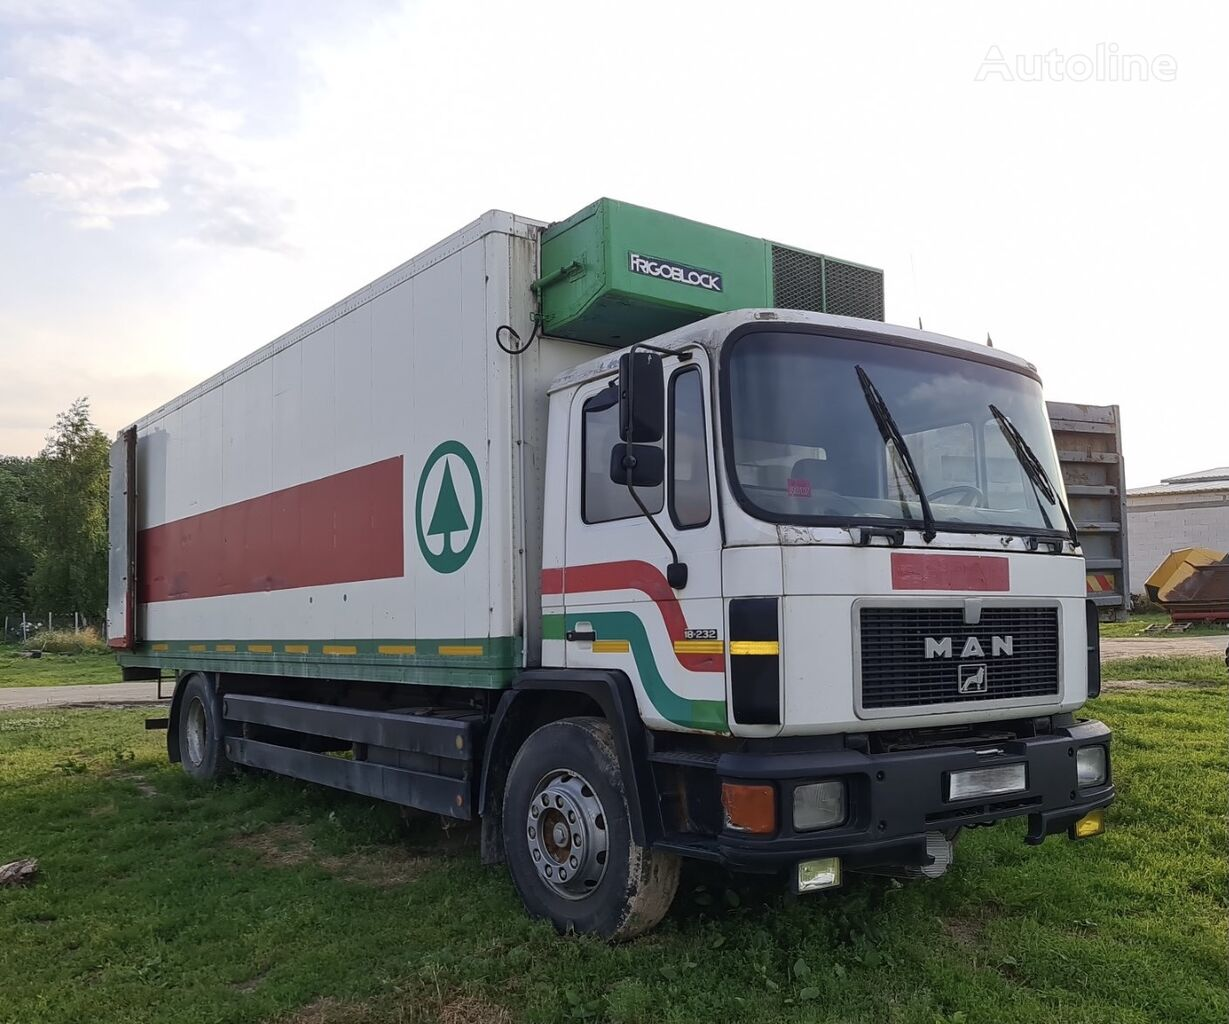 MAN 18.232 refrigerated truck